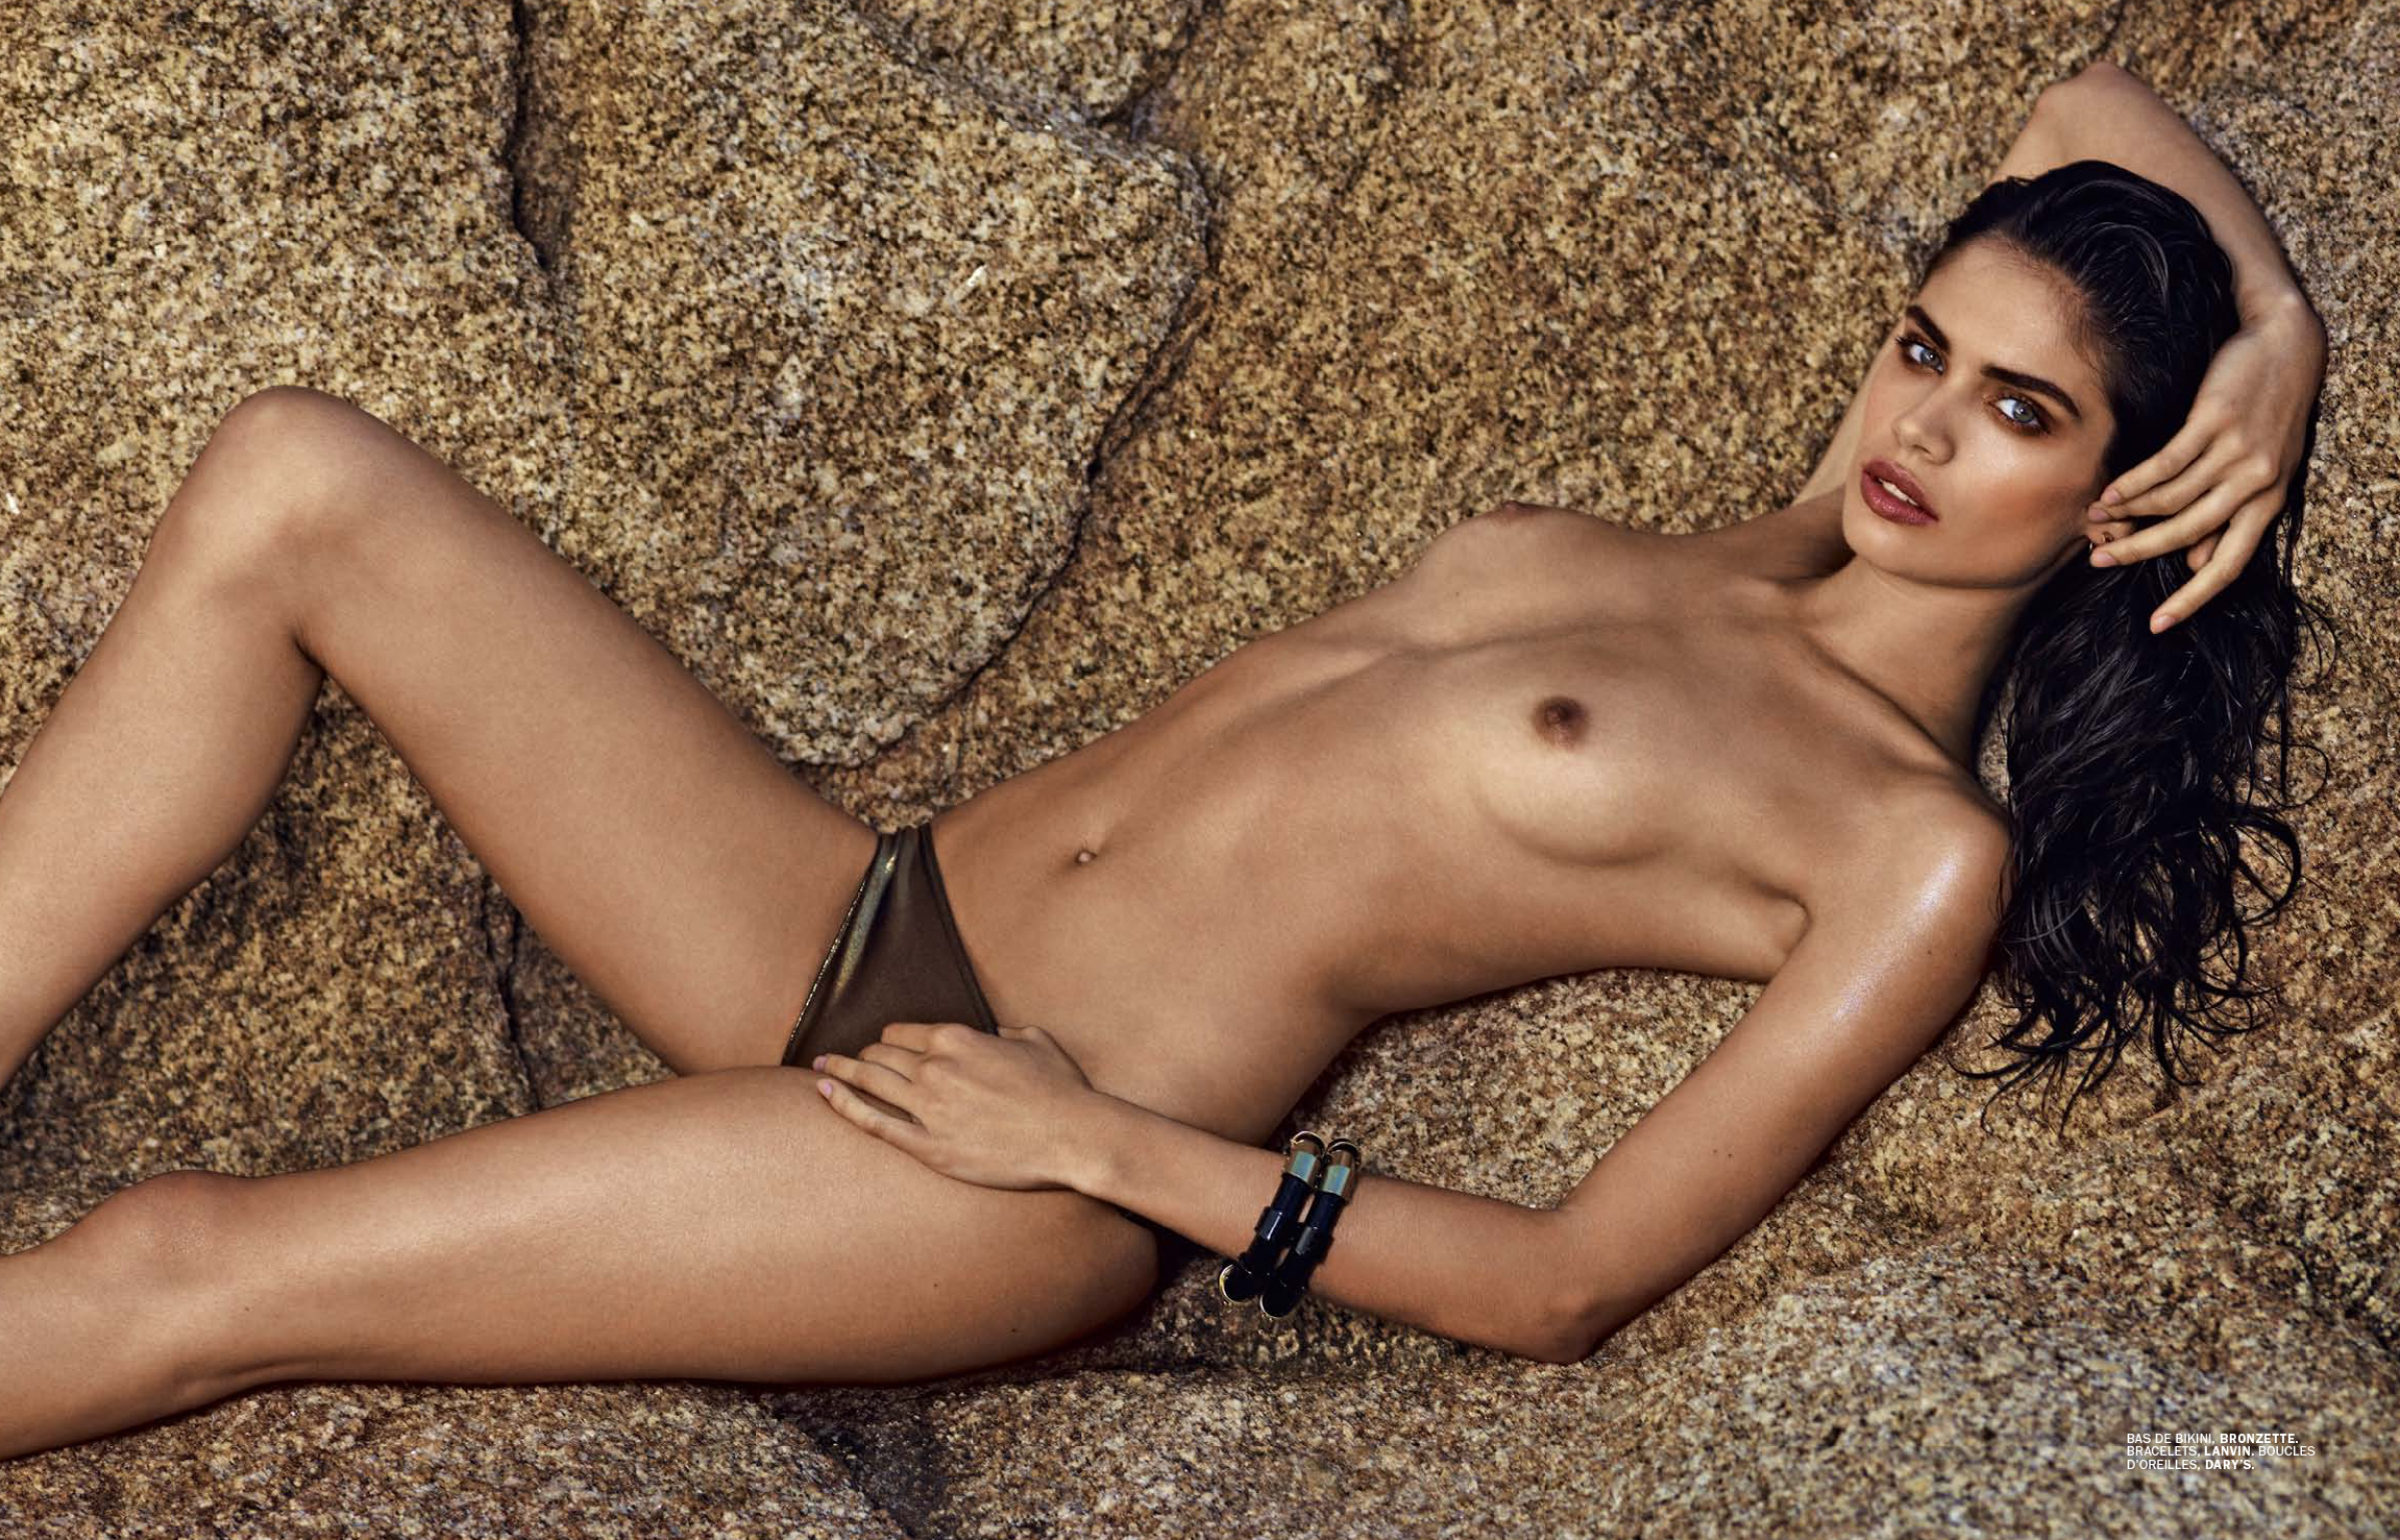 Sara Sampaio - breasts